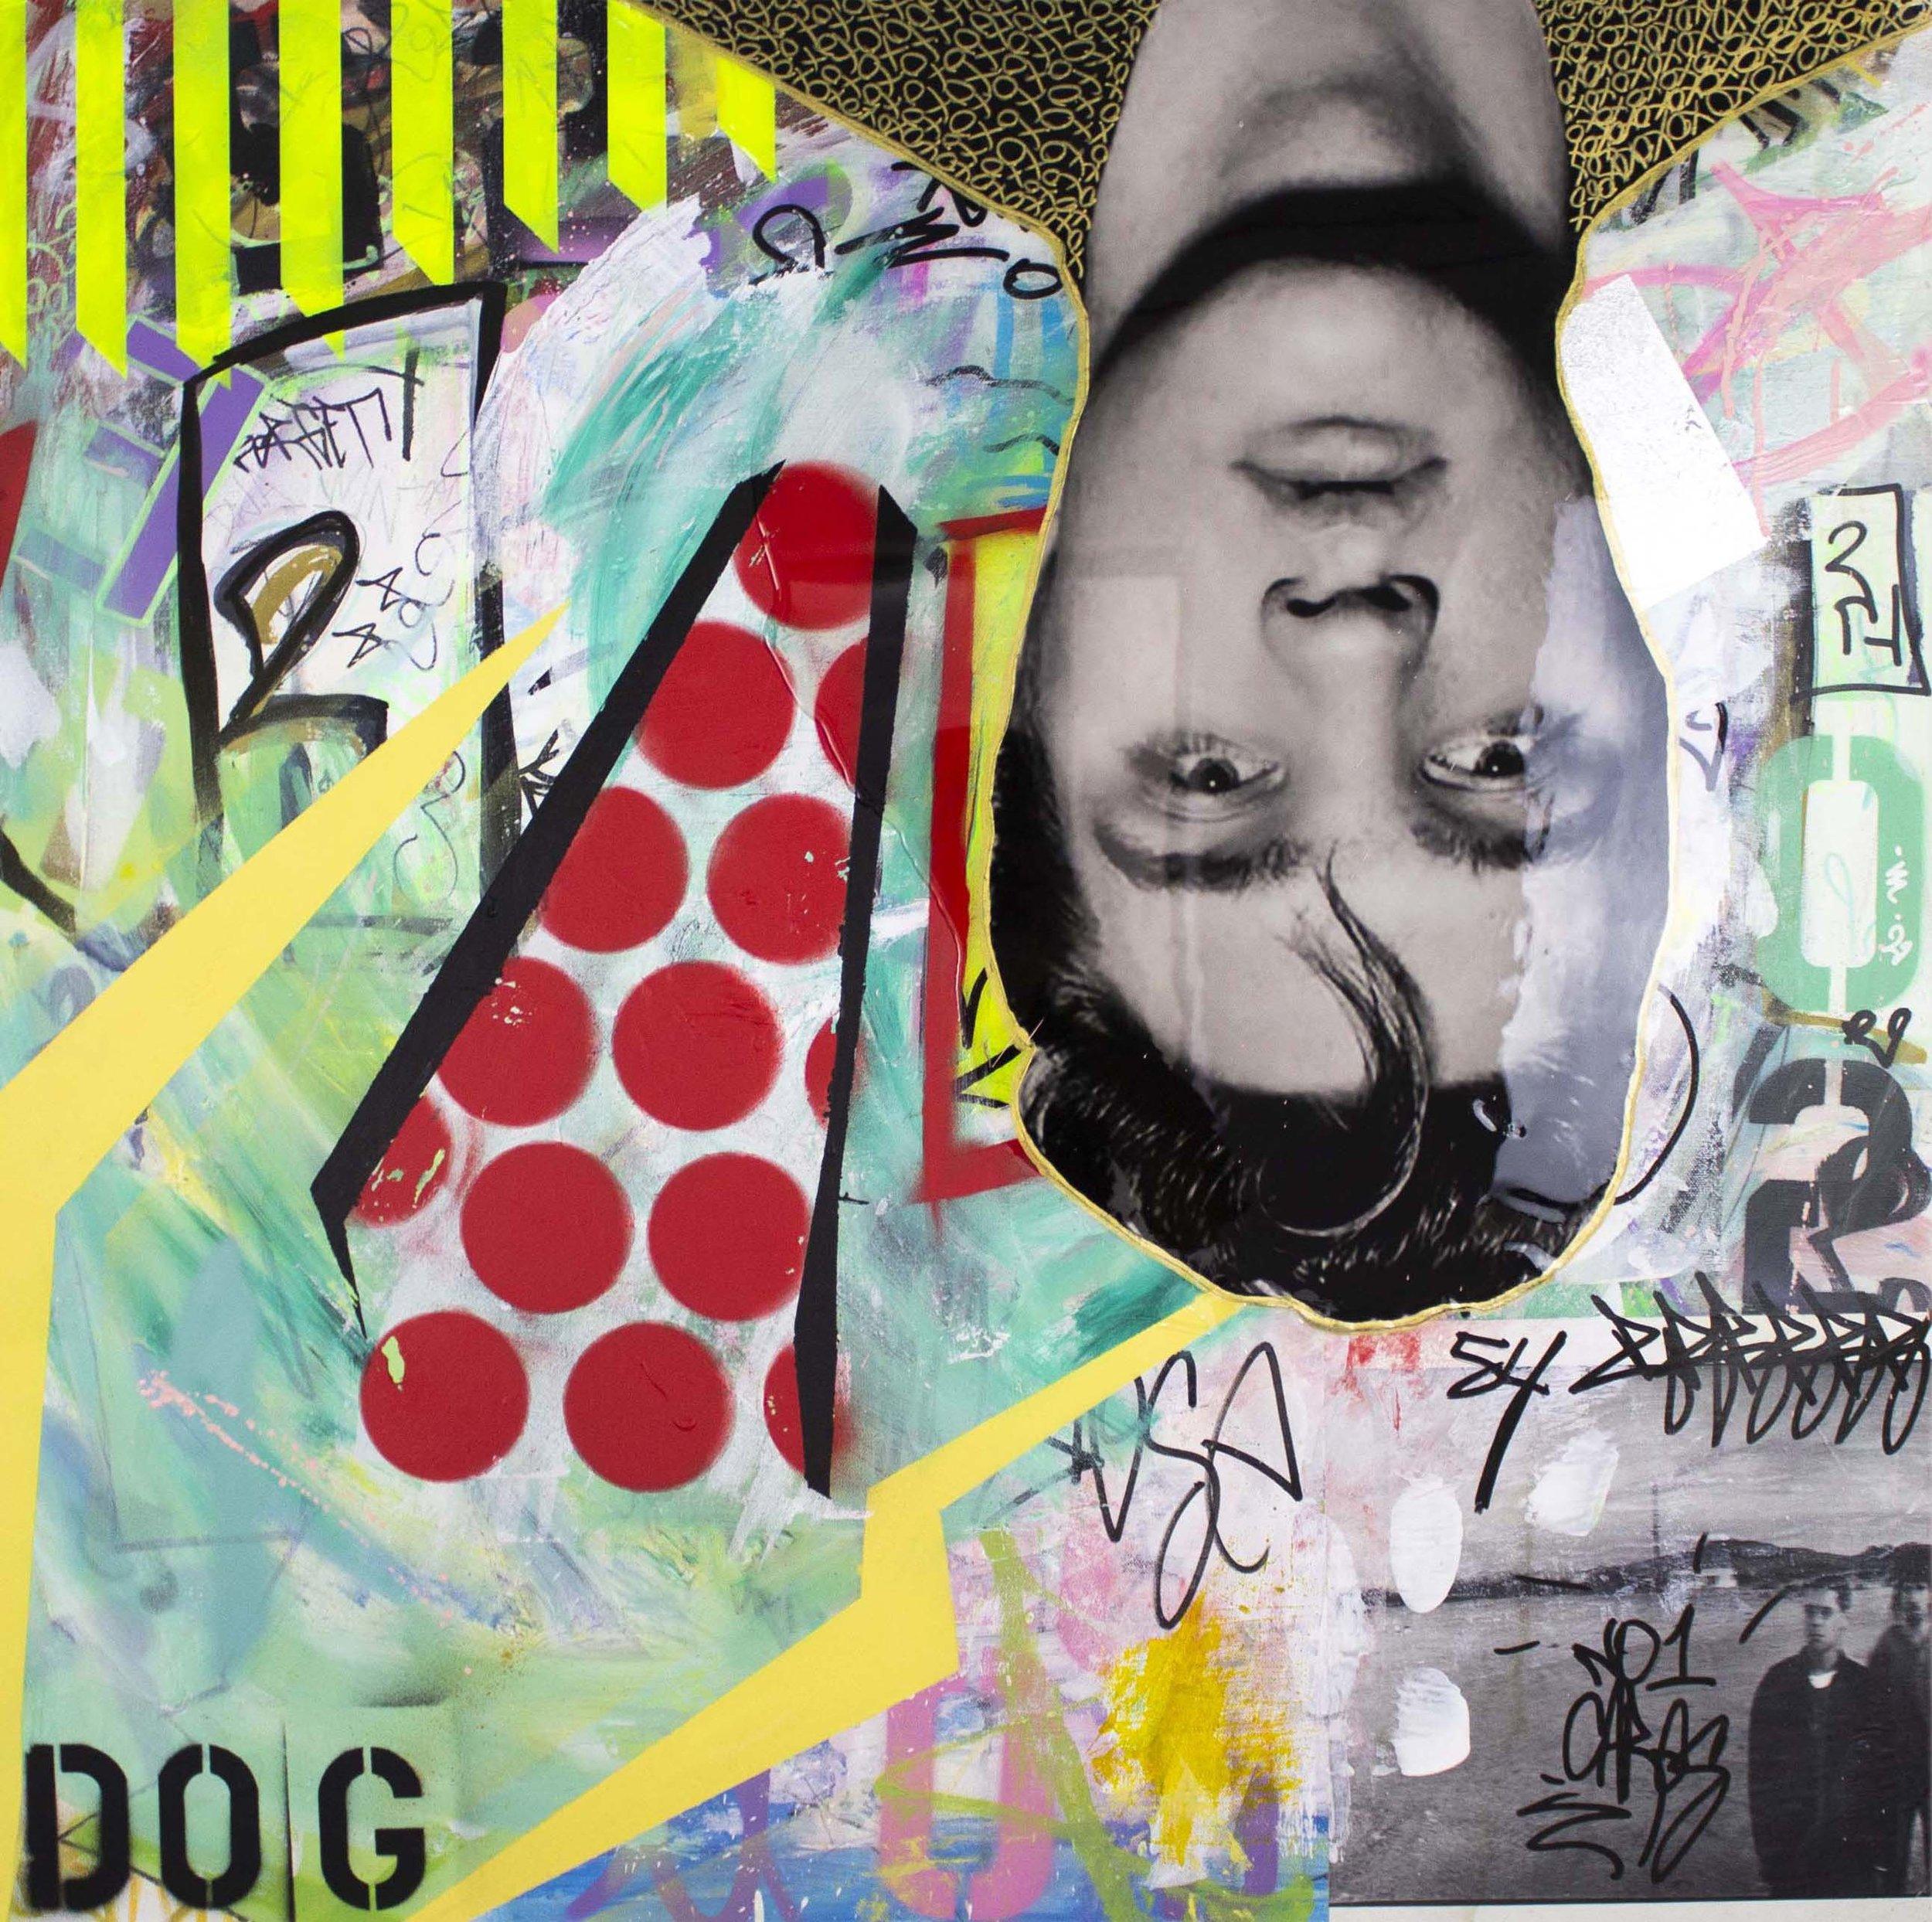 14-Hound Dog 30x40 - 2000.jpg